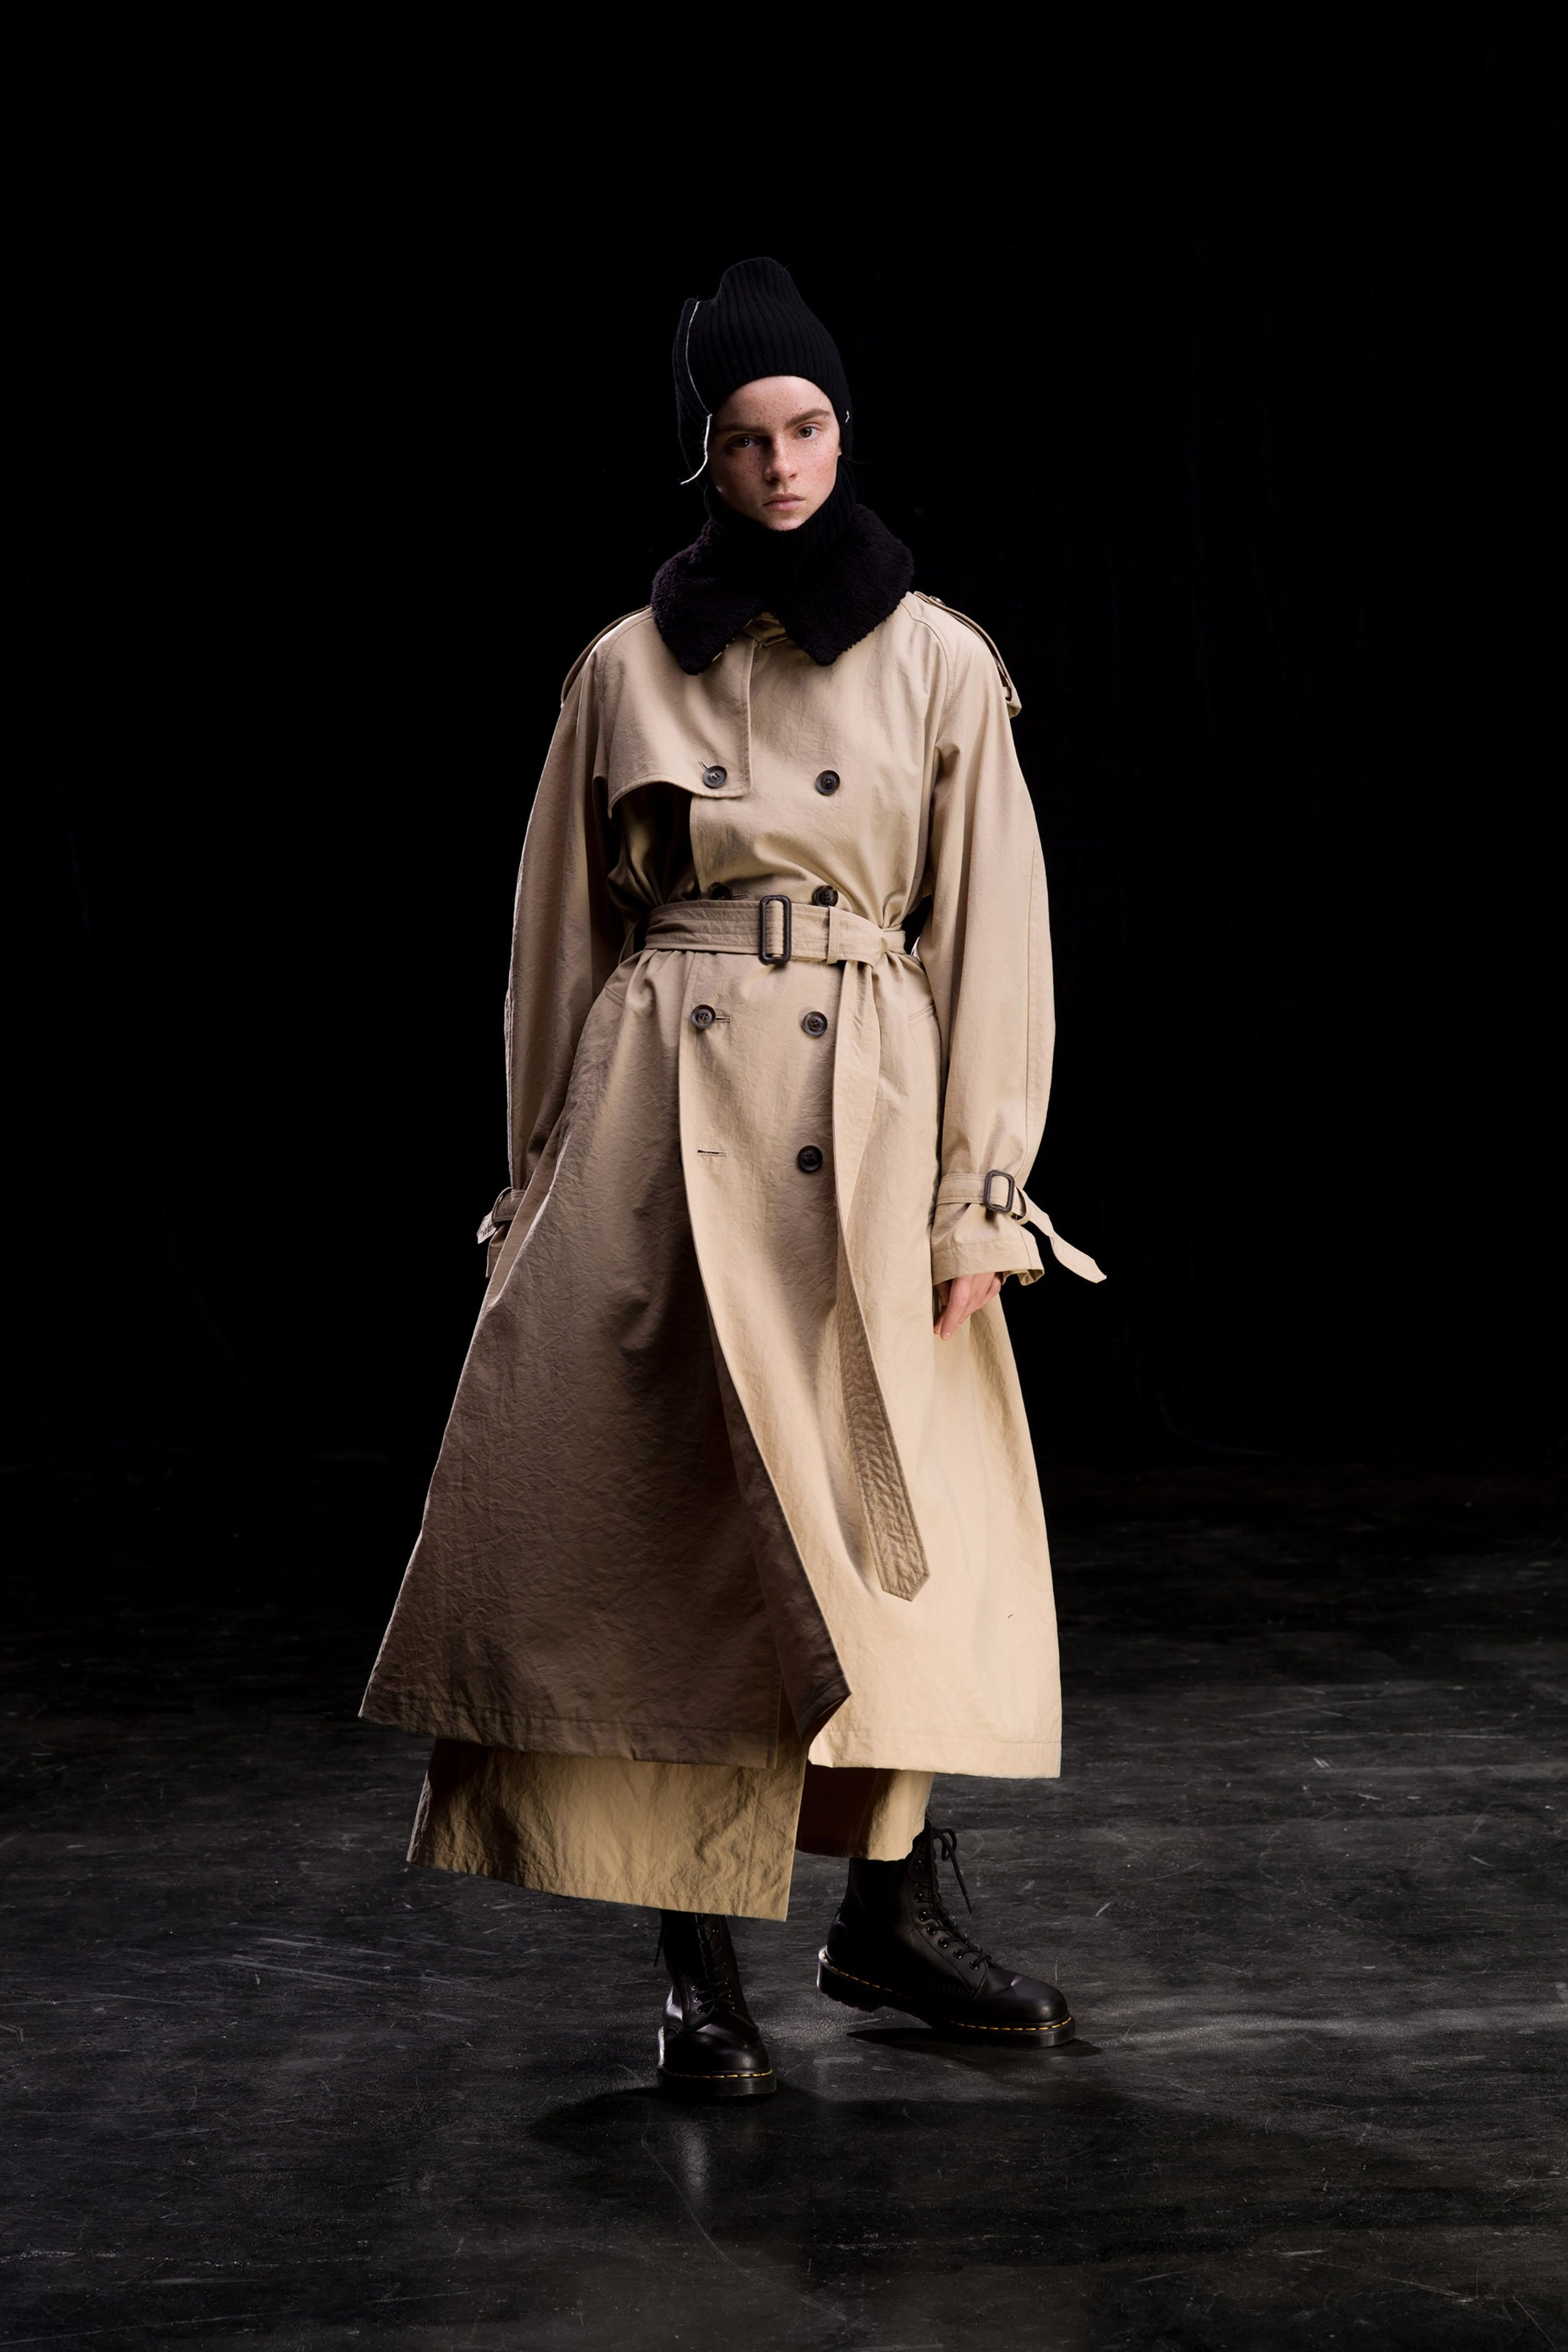 00014-Ys-Yohji-Yamamoto-FALL-19-Ready-To-Wear.jpg